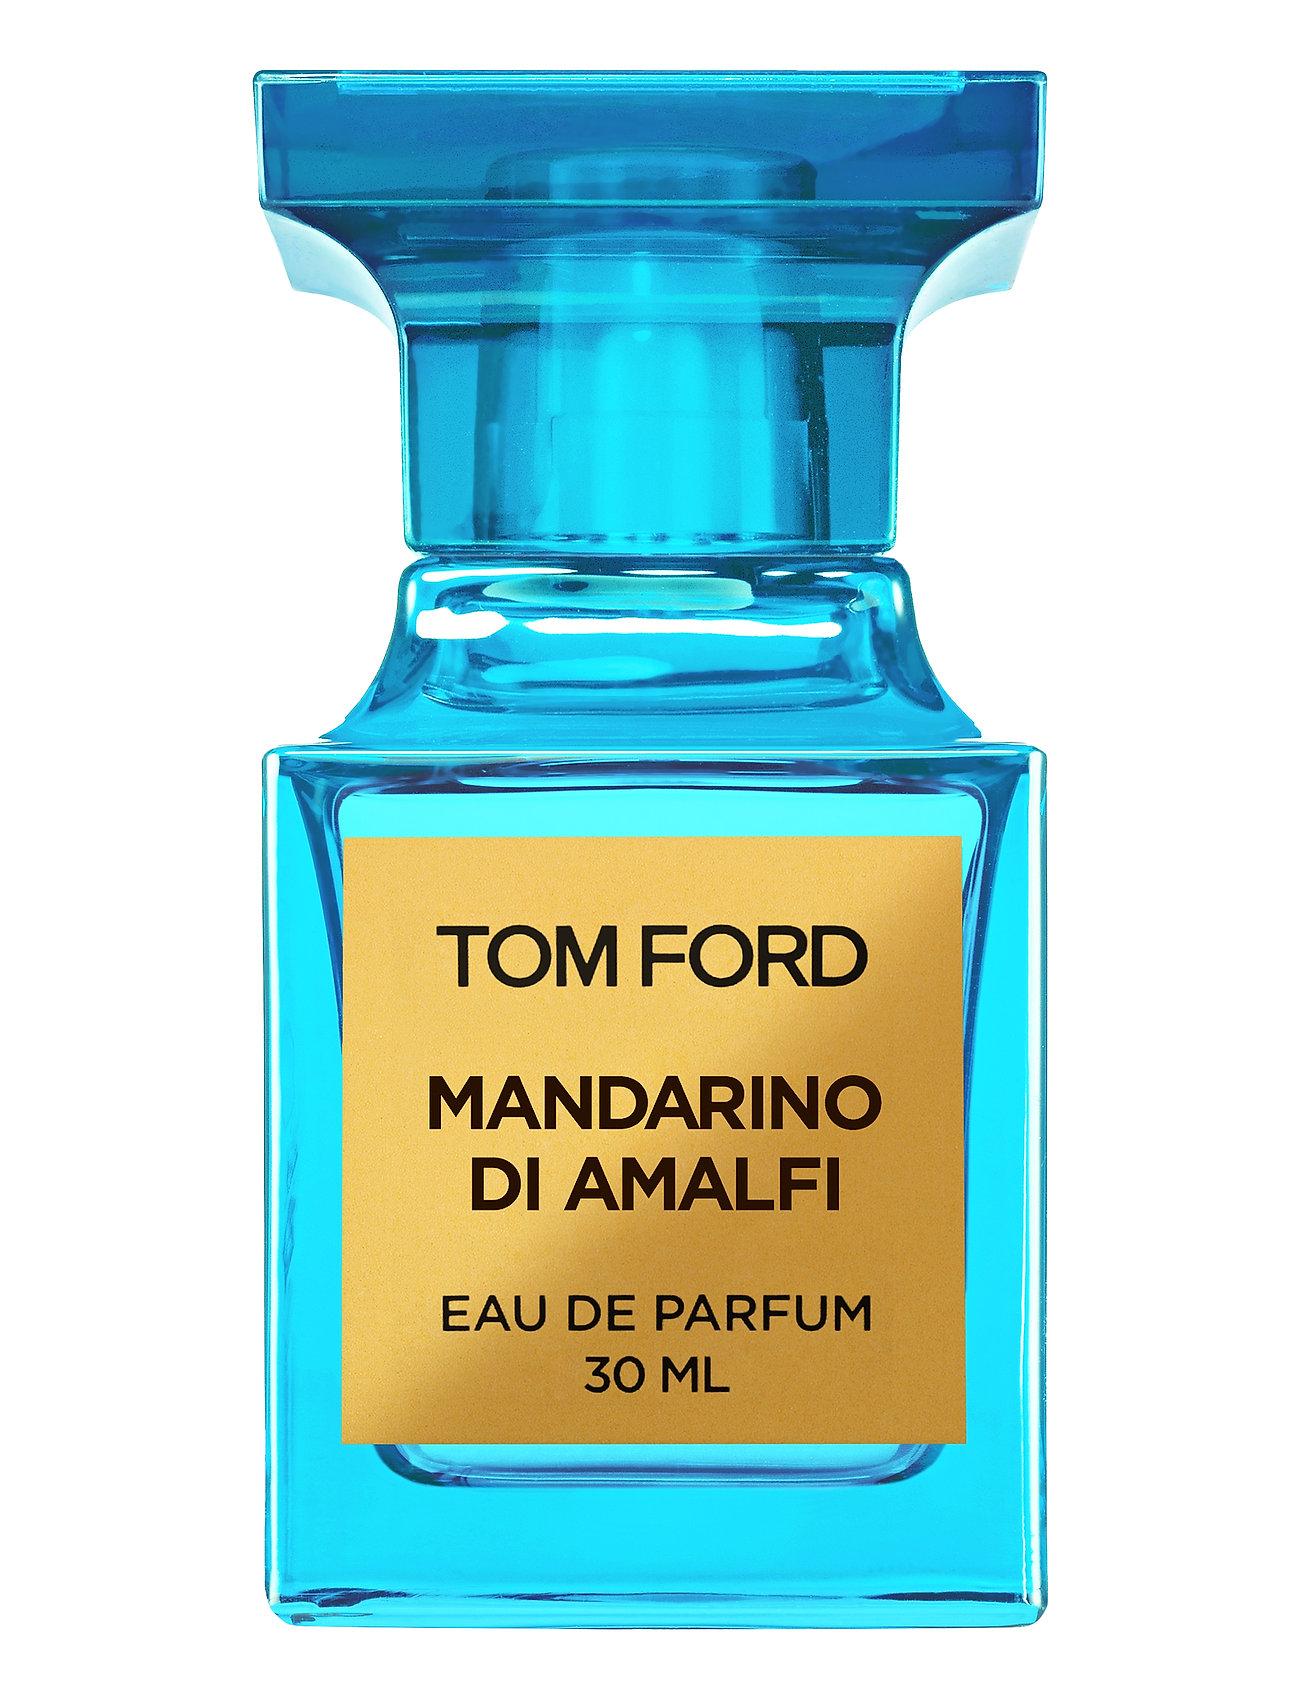 tom ford – Mandarino di amalfi eau de parfum på boozt.com dk